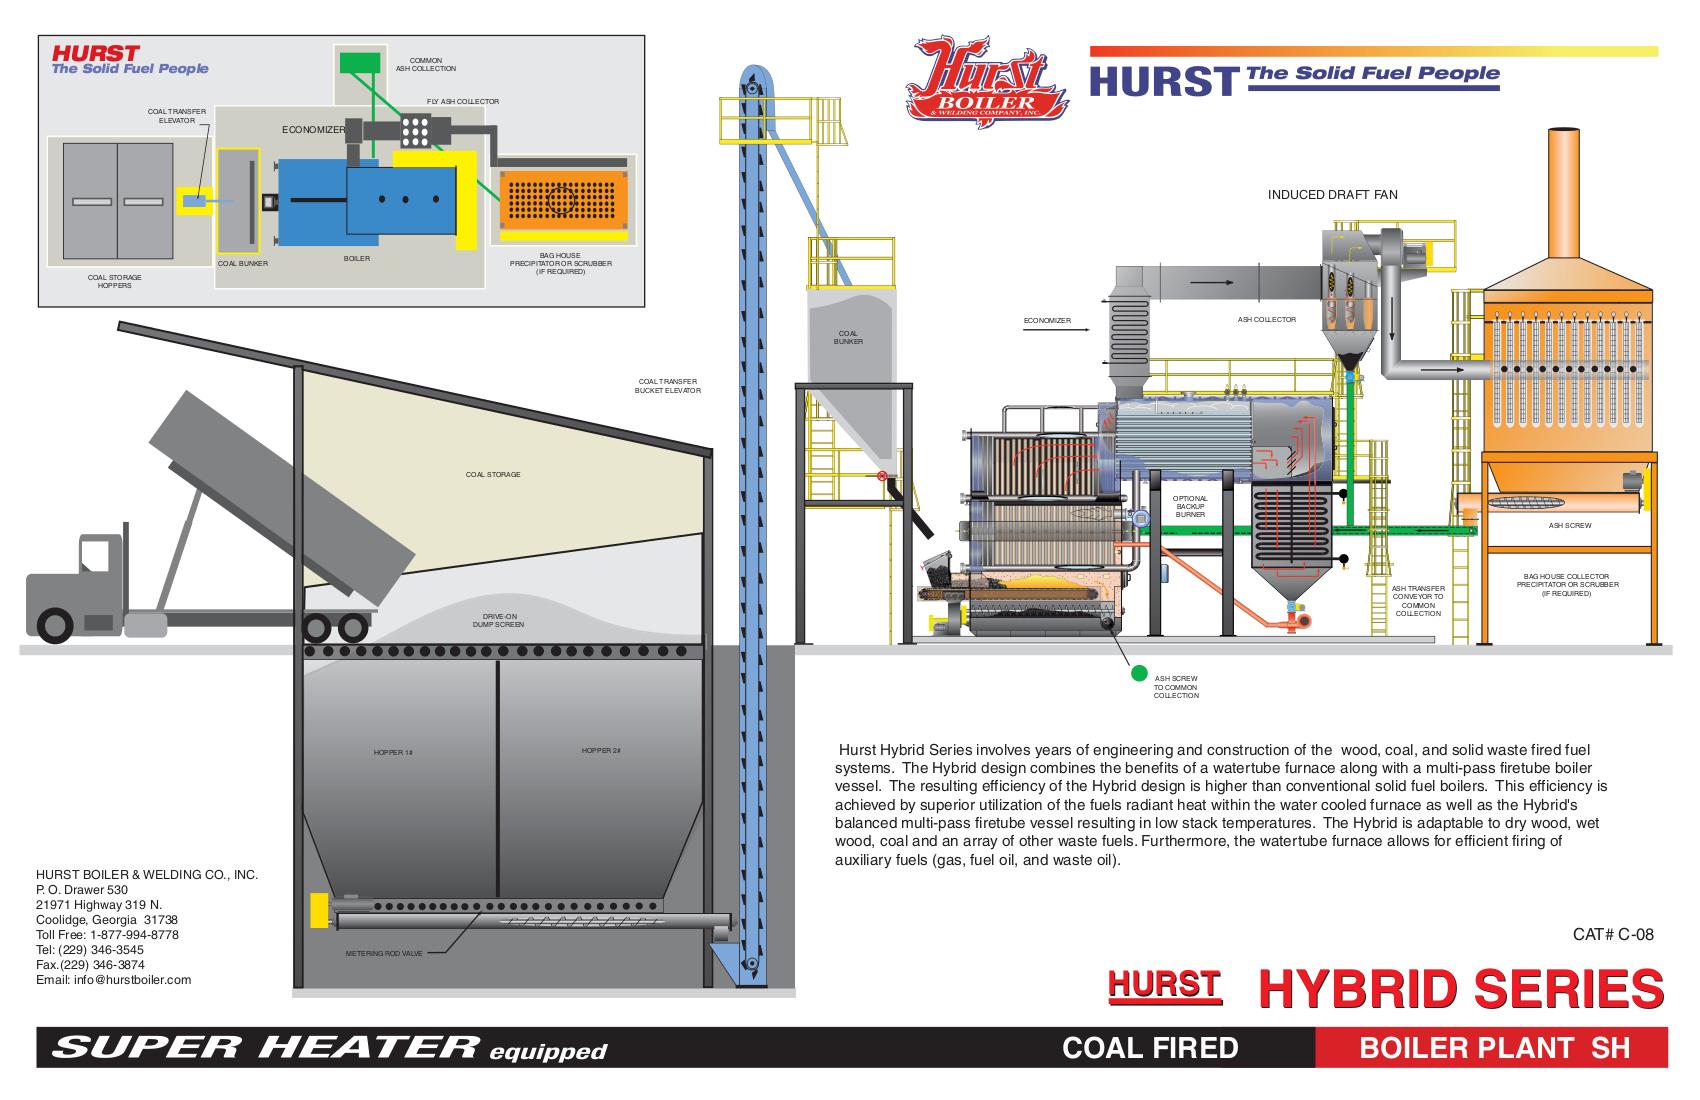 Coal Fired Boiler Schematic Diagrams Hurst Wiring Diagram Circuit Symbols U2022 Wood Boilers For Home Heating